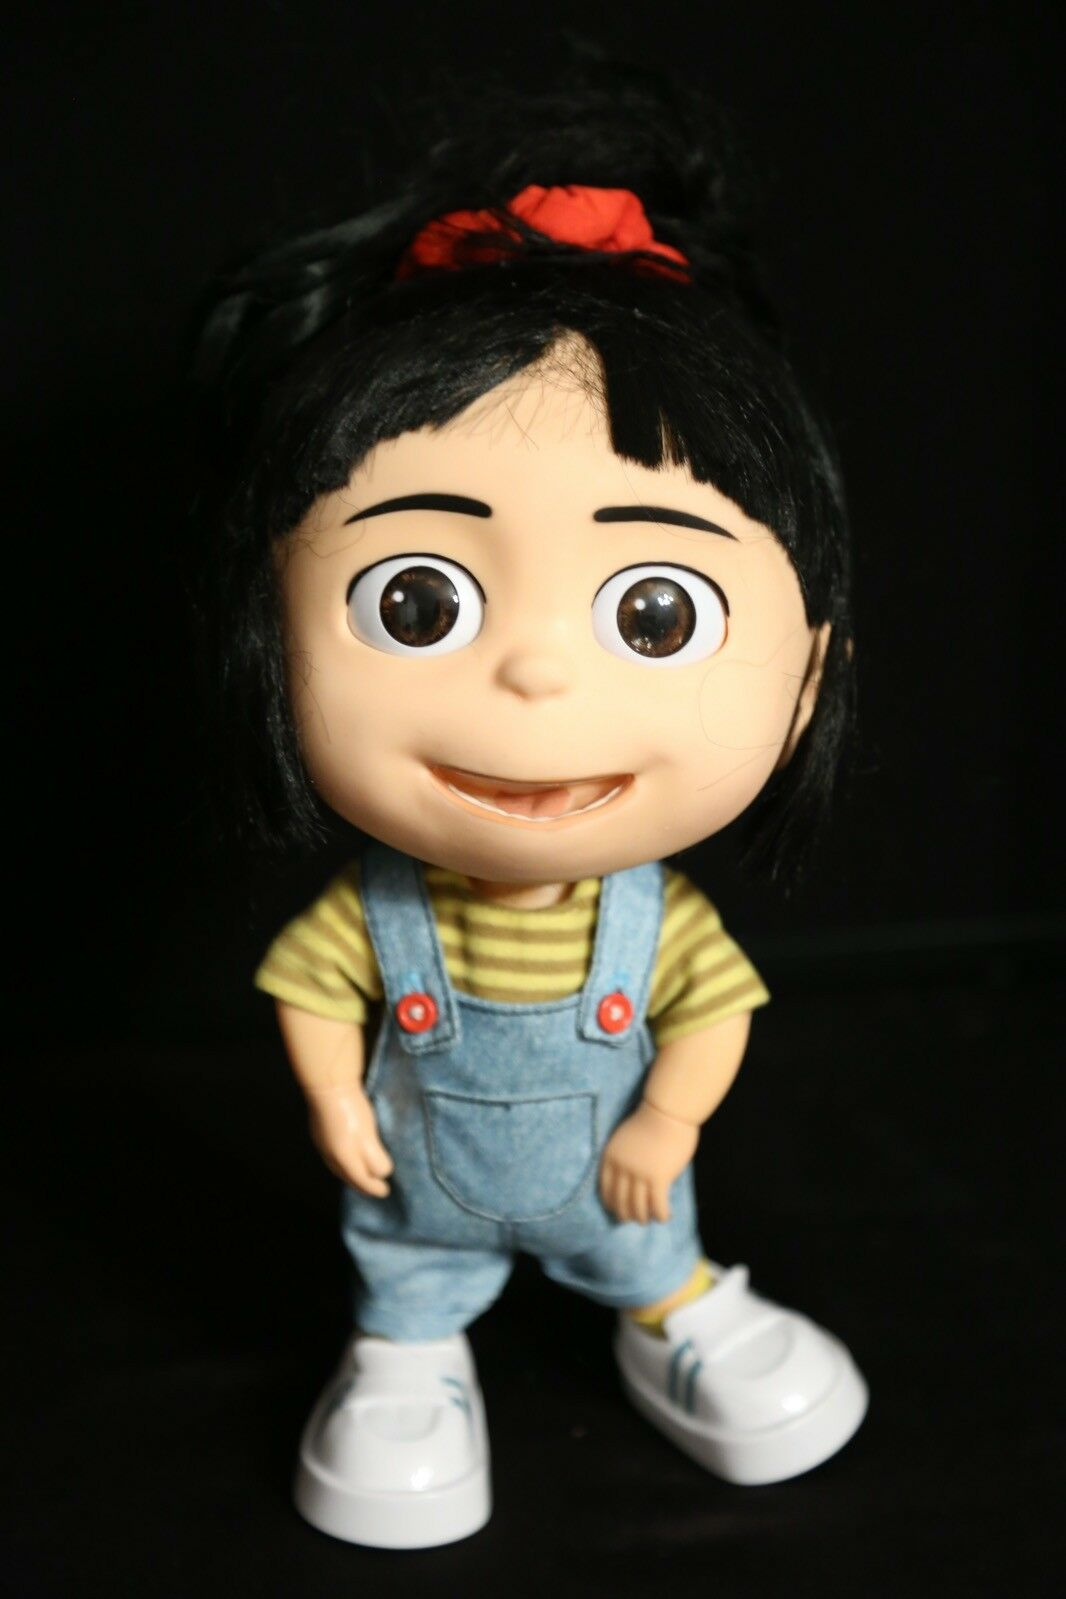 Despicible Me Talking AGNUS Doll Thinkway Toys